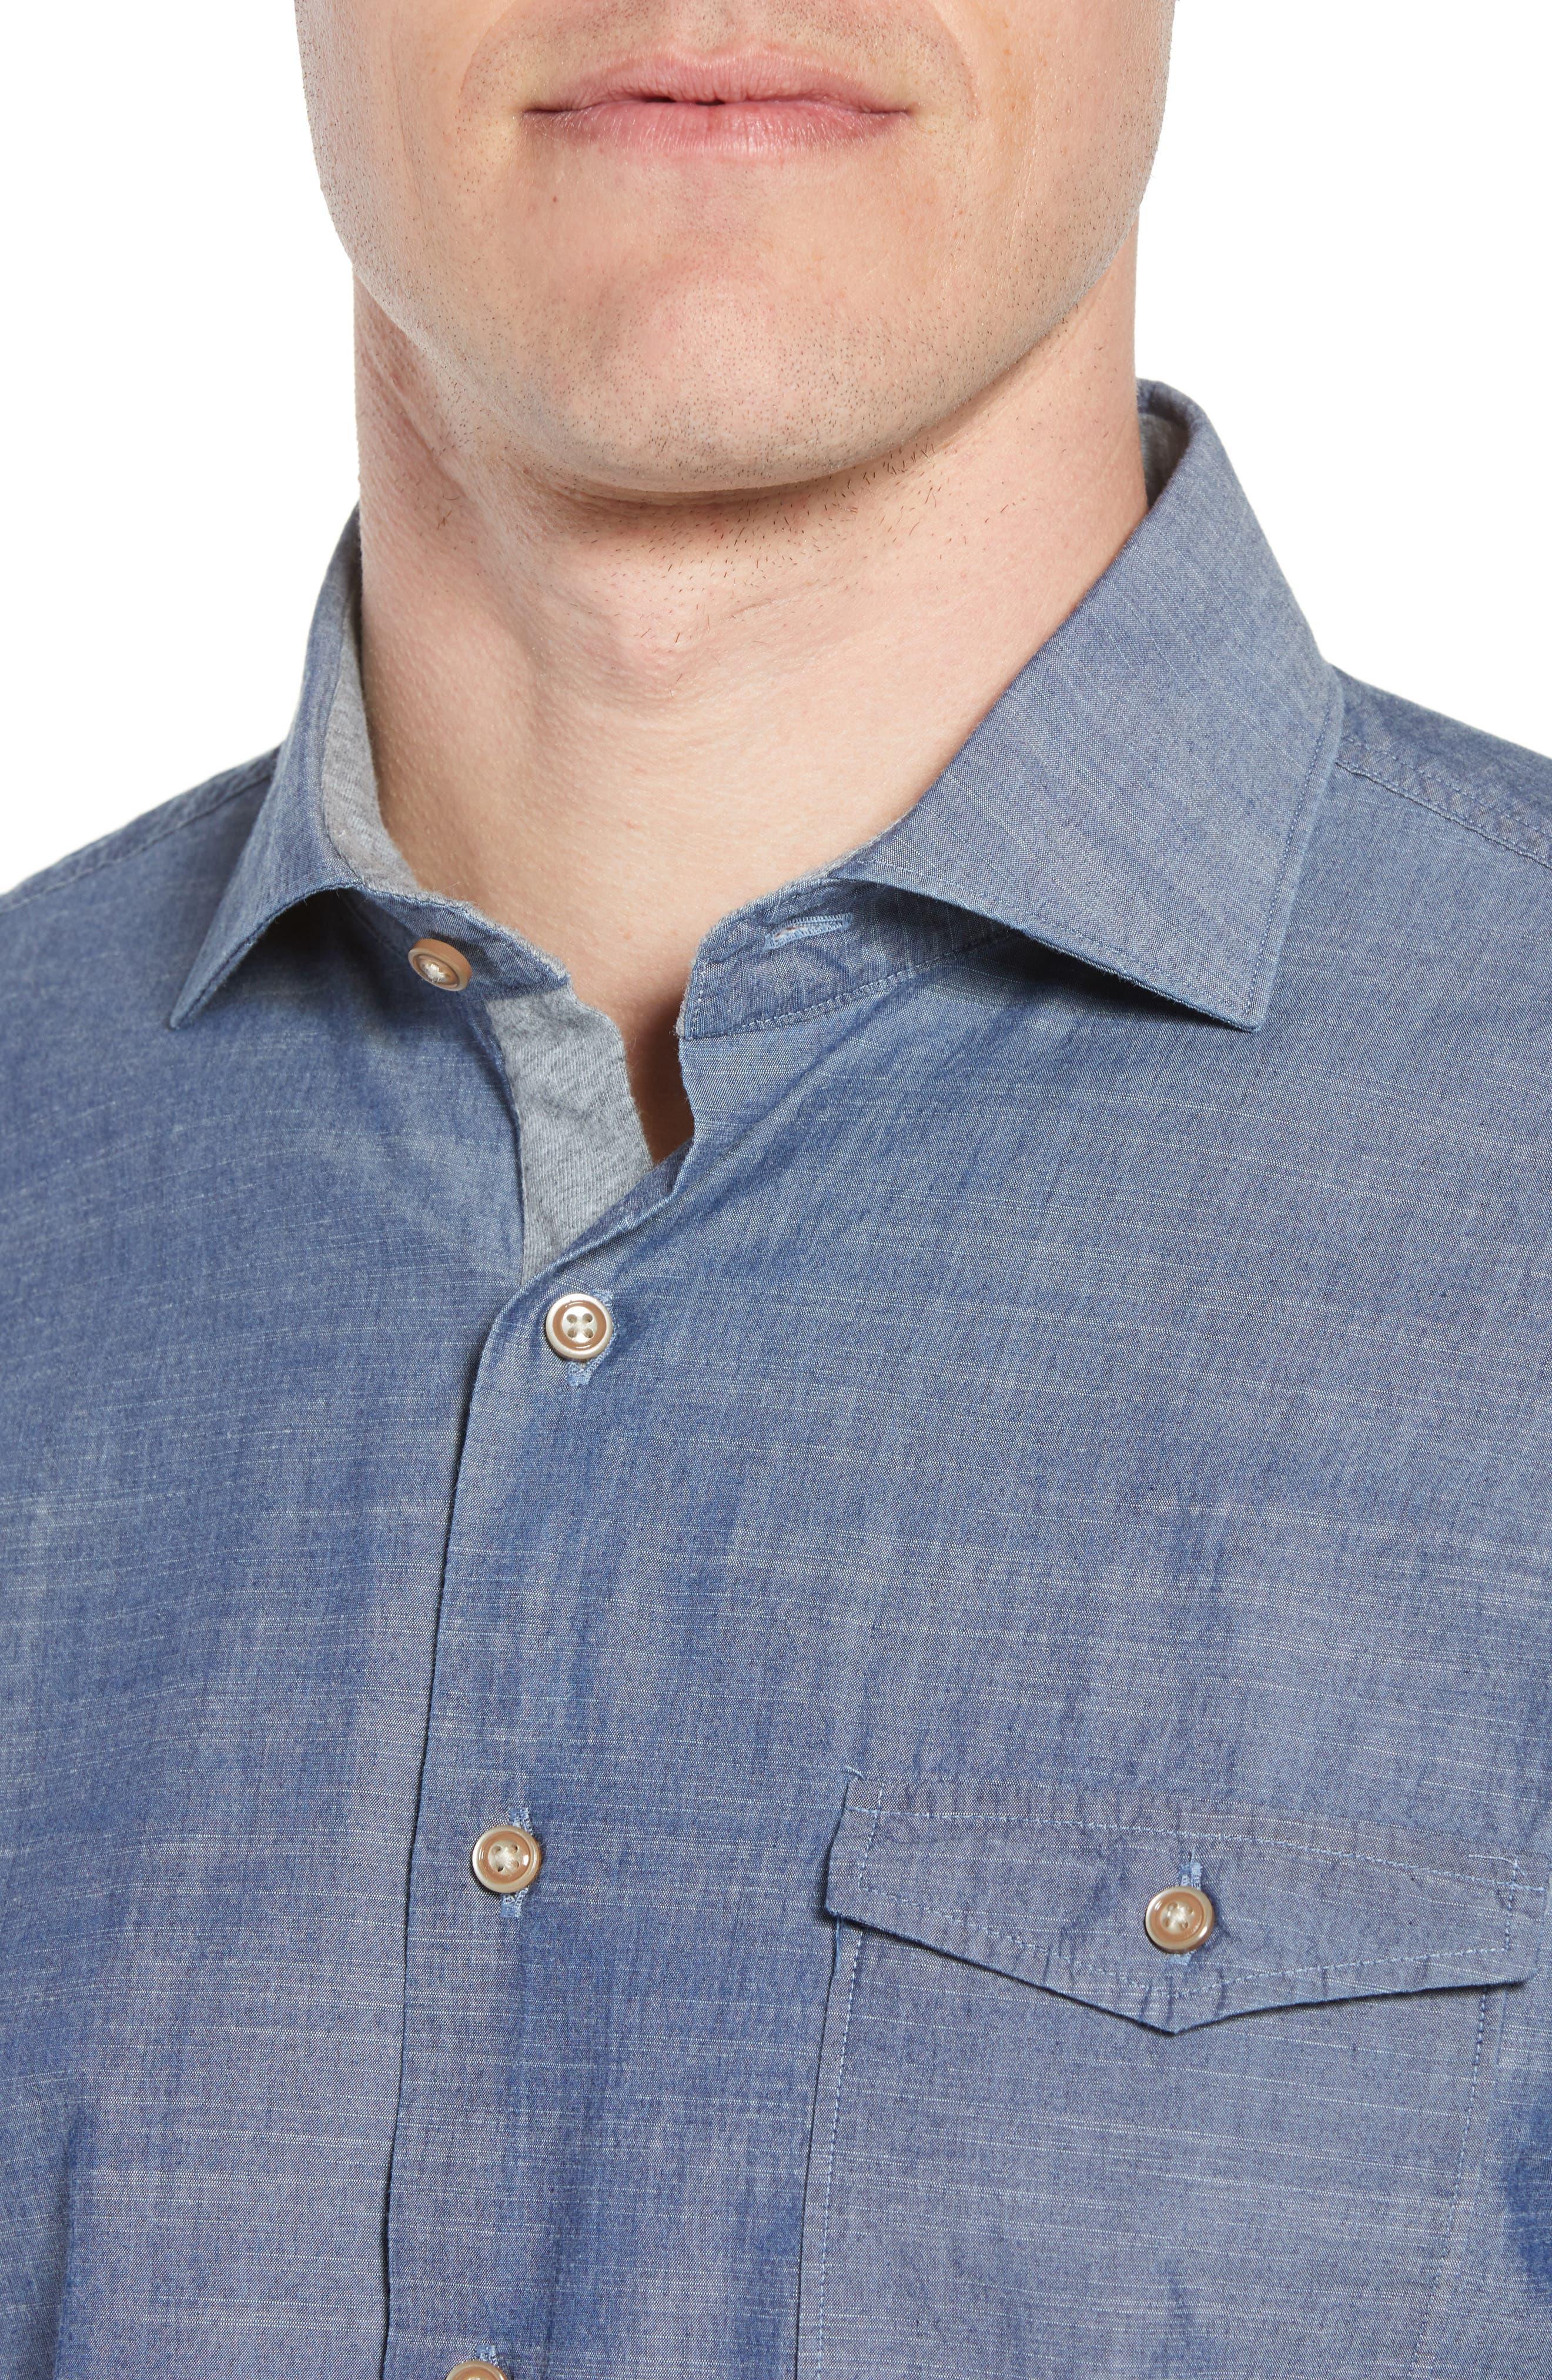 Lucas Regular Fit Chambray Sport Shirt,                             Alternate thumbnail 4, color,                             403